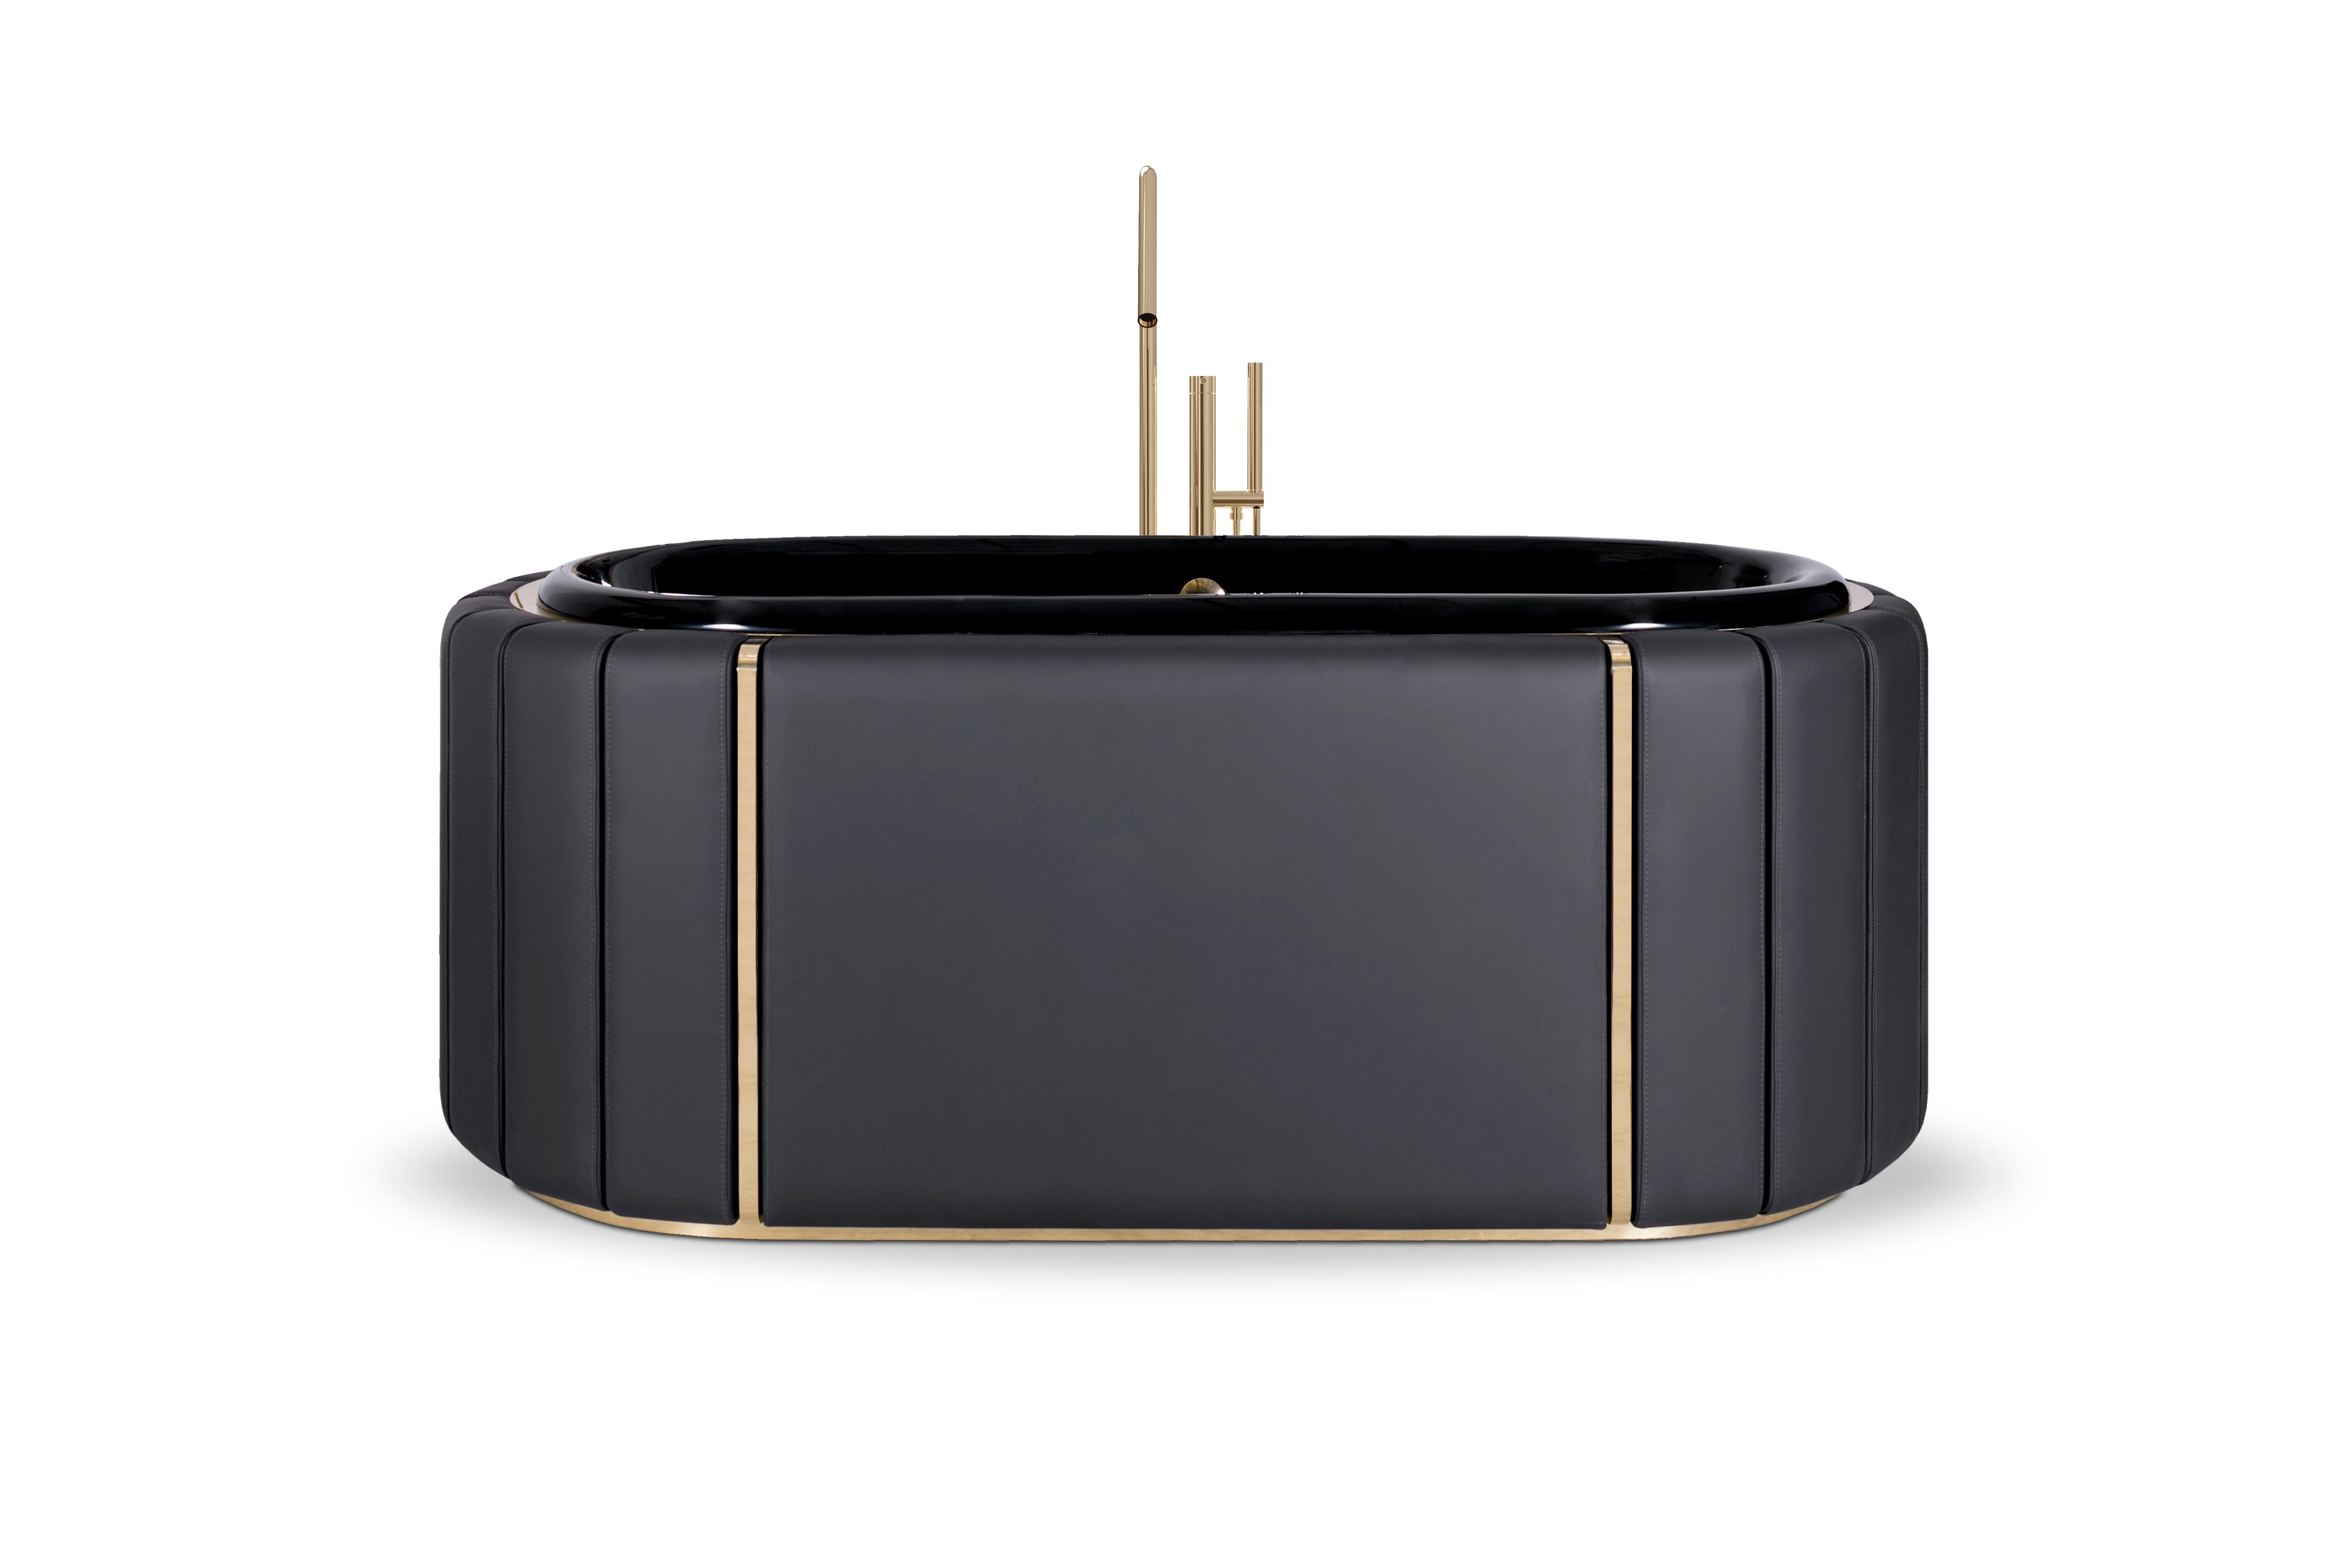 Shake up your bathroom with Maison Valentina´s luxurious bathtubs luxurious bathtubs Shake up your bathroom with Maison Valentina´s luxurious bathtubs darian bathtub 1